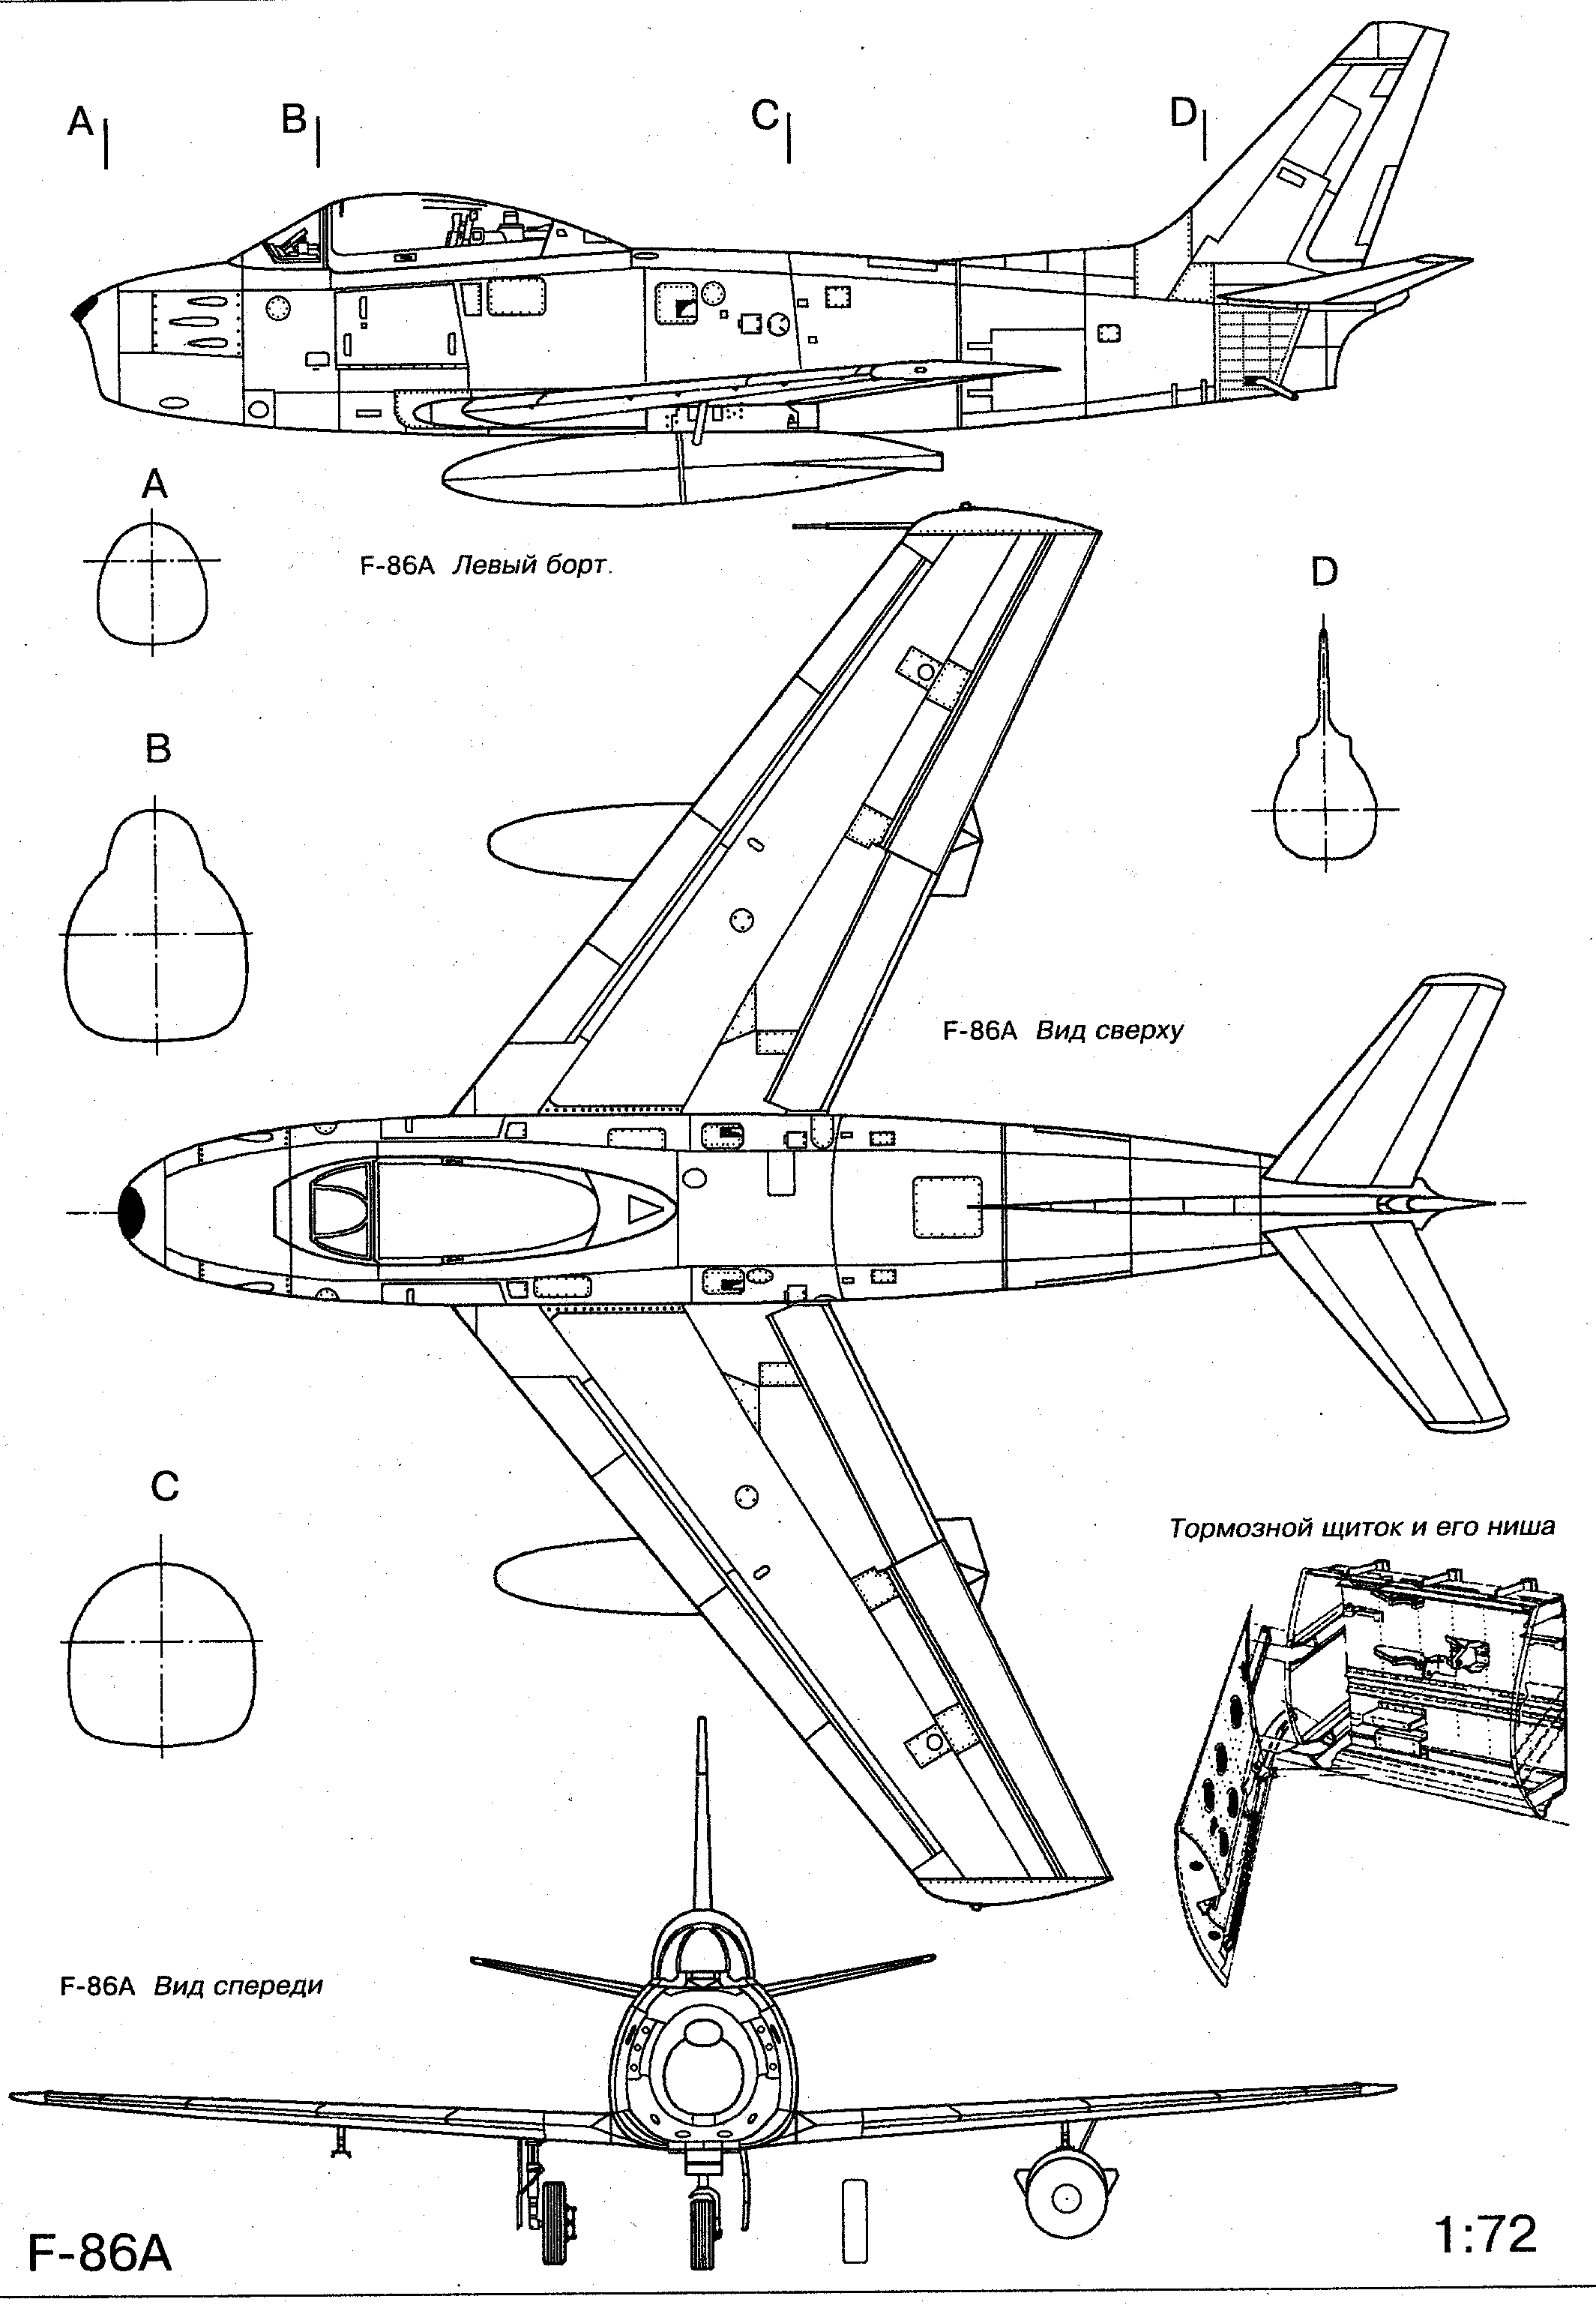 general aviation scale diagram 1996 nissan maxima wiring f 86 sabre blueprint planes pinterest aircraft